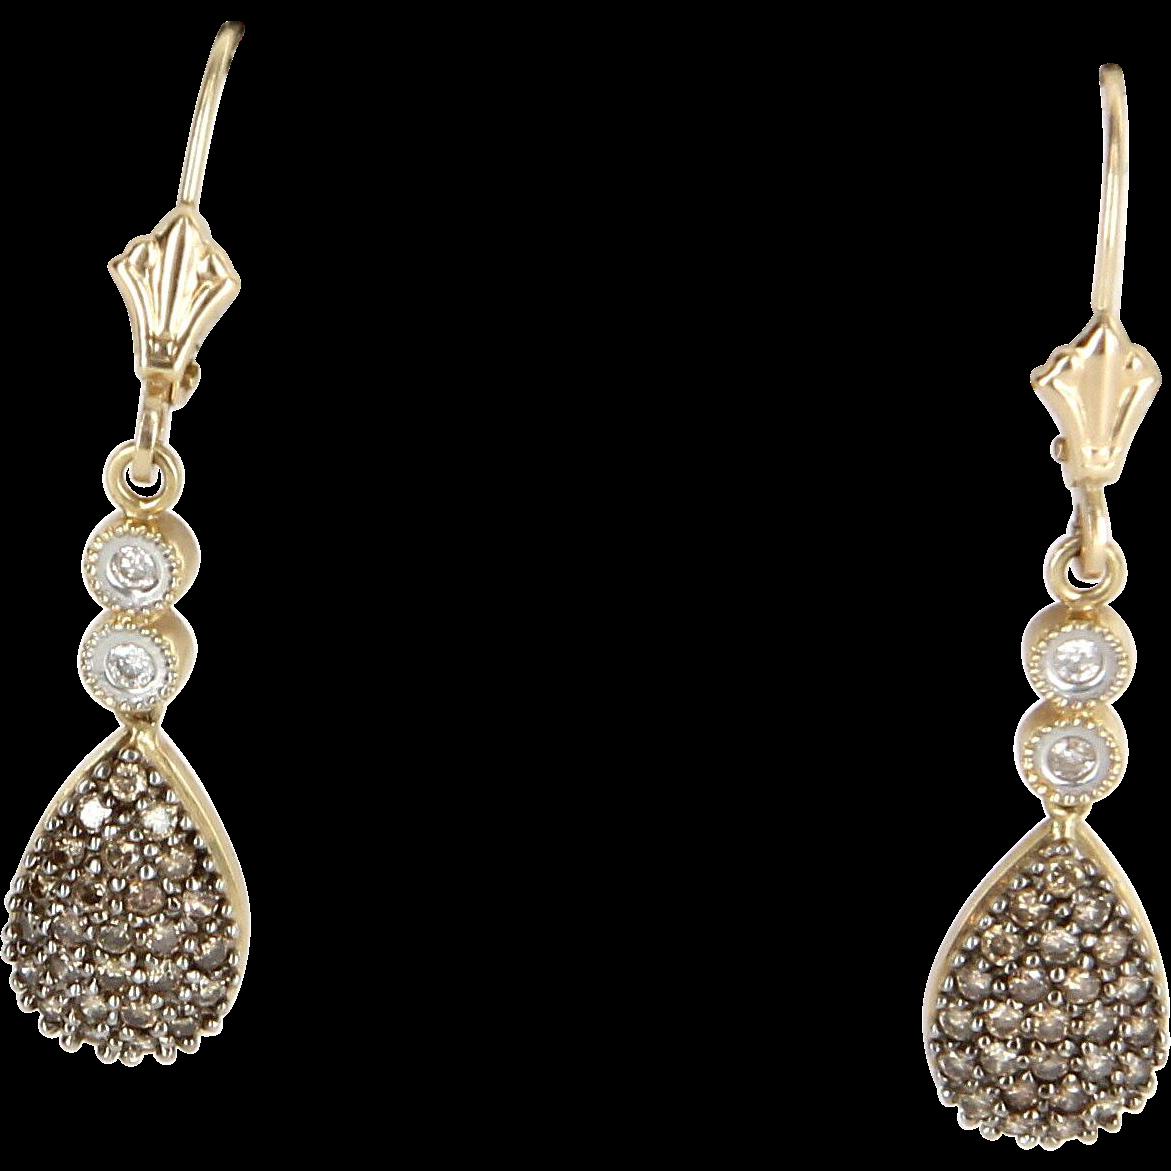 chocolate diamond drop earrings vintage 14k yellow gold. Black Bedroom Furniture Sets. Home Design Ideas